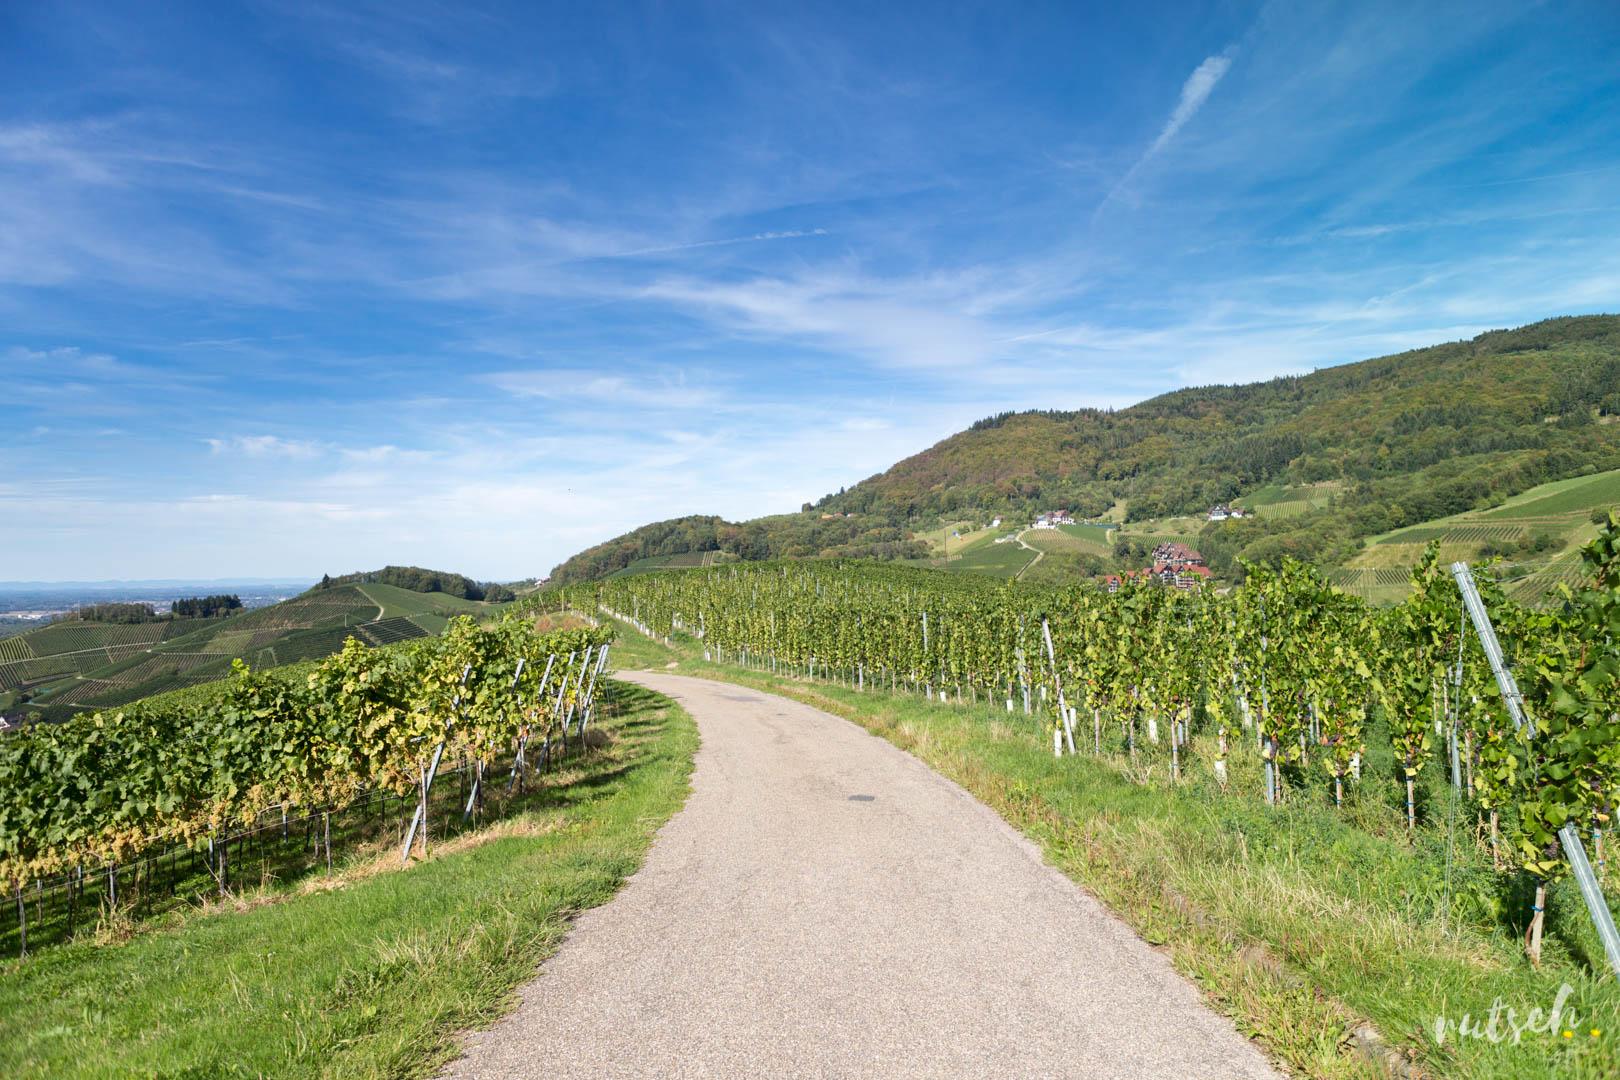 Schnapsbrunnen chemin de randonnée Sasbachwalden